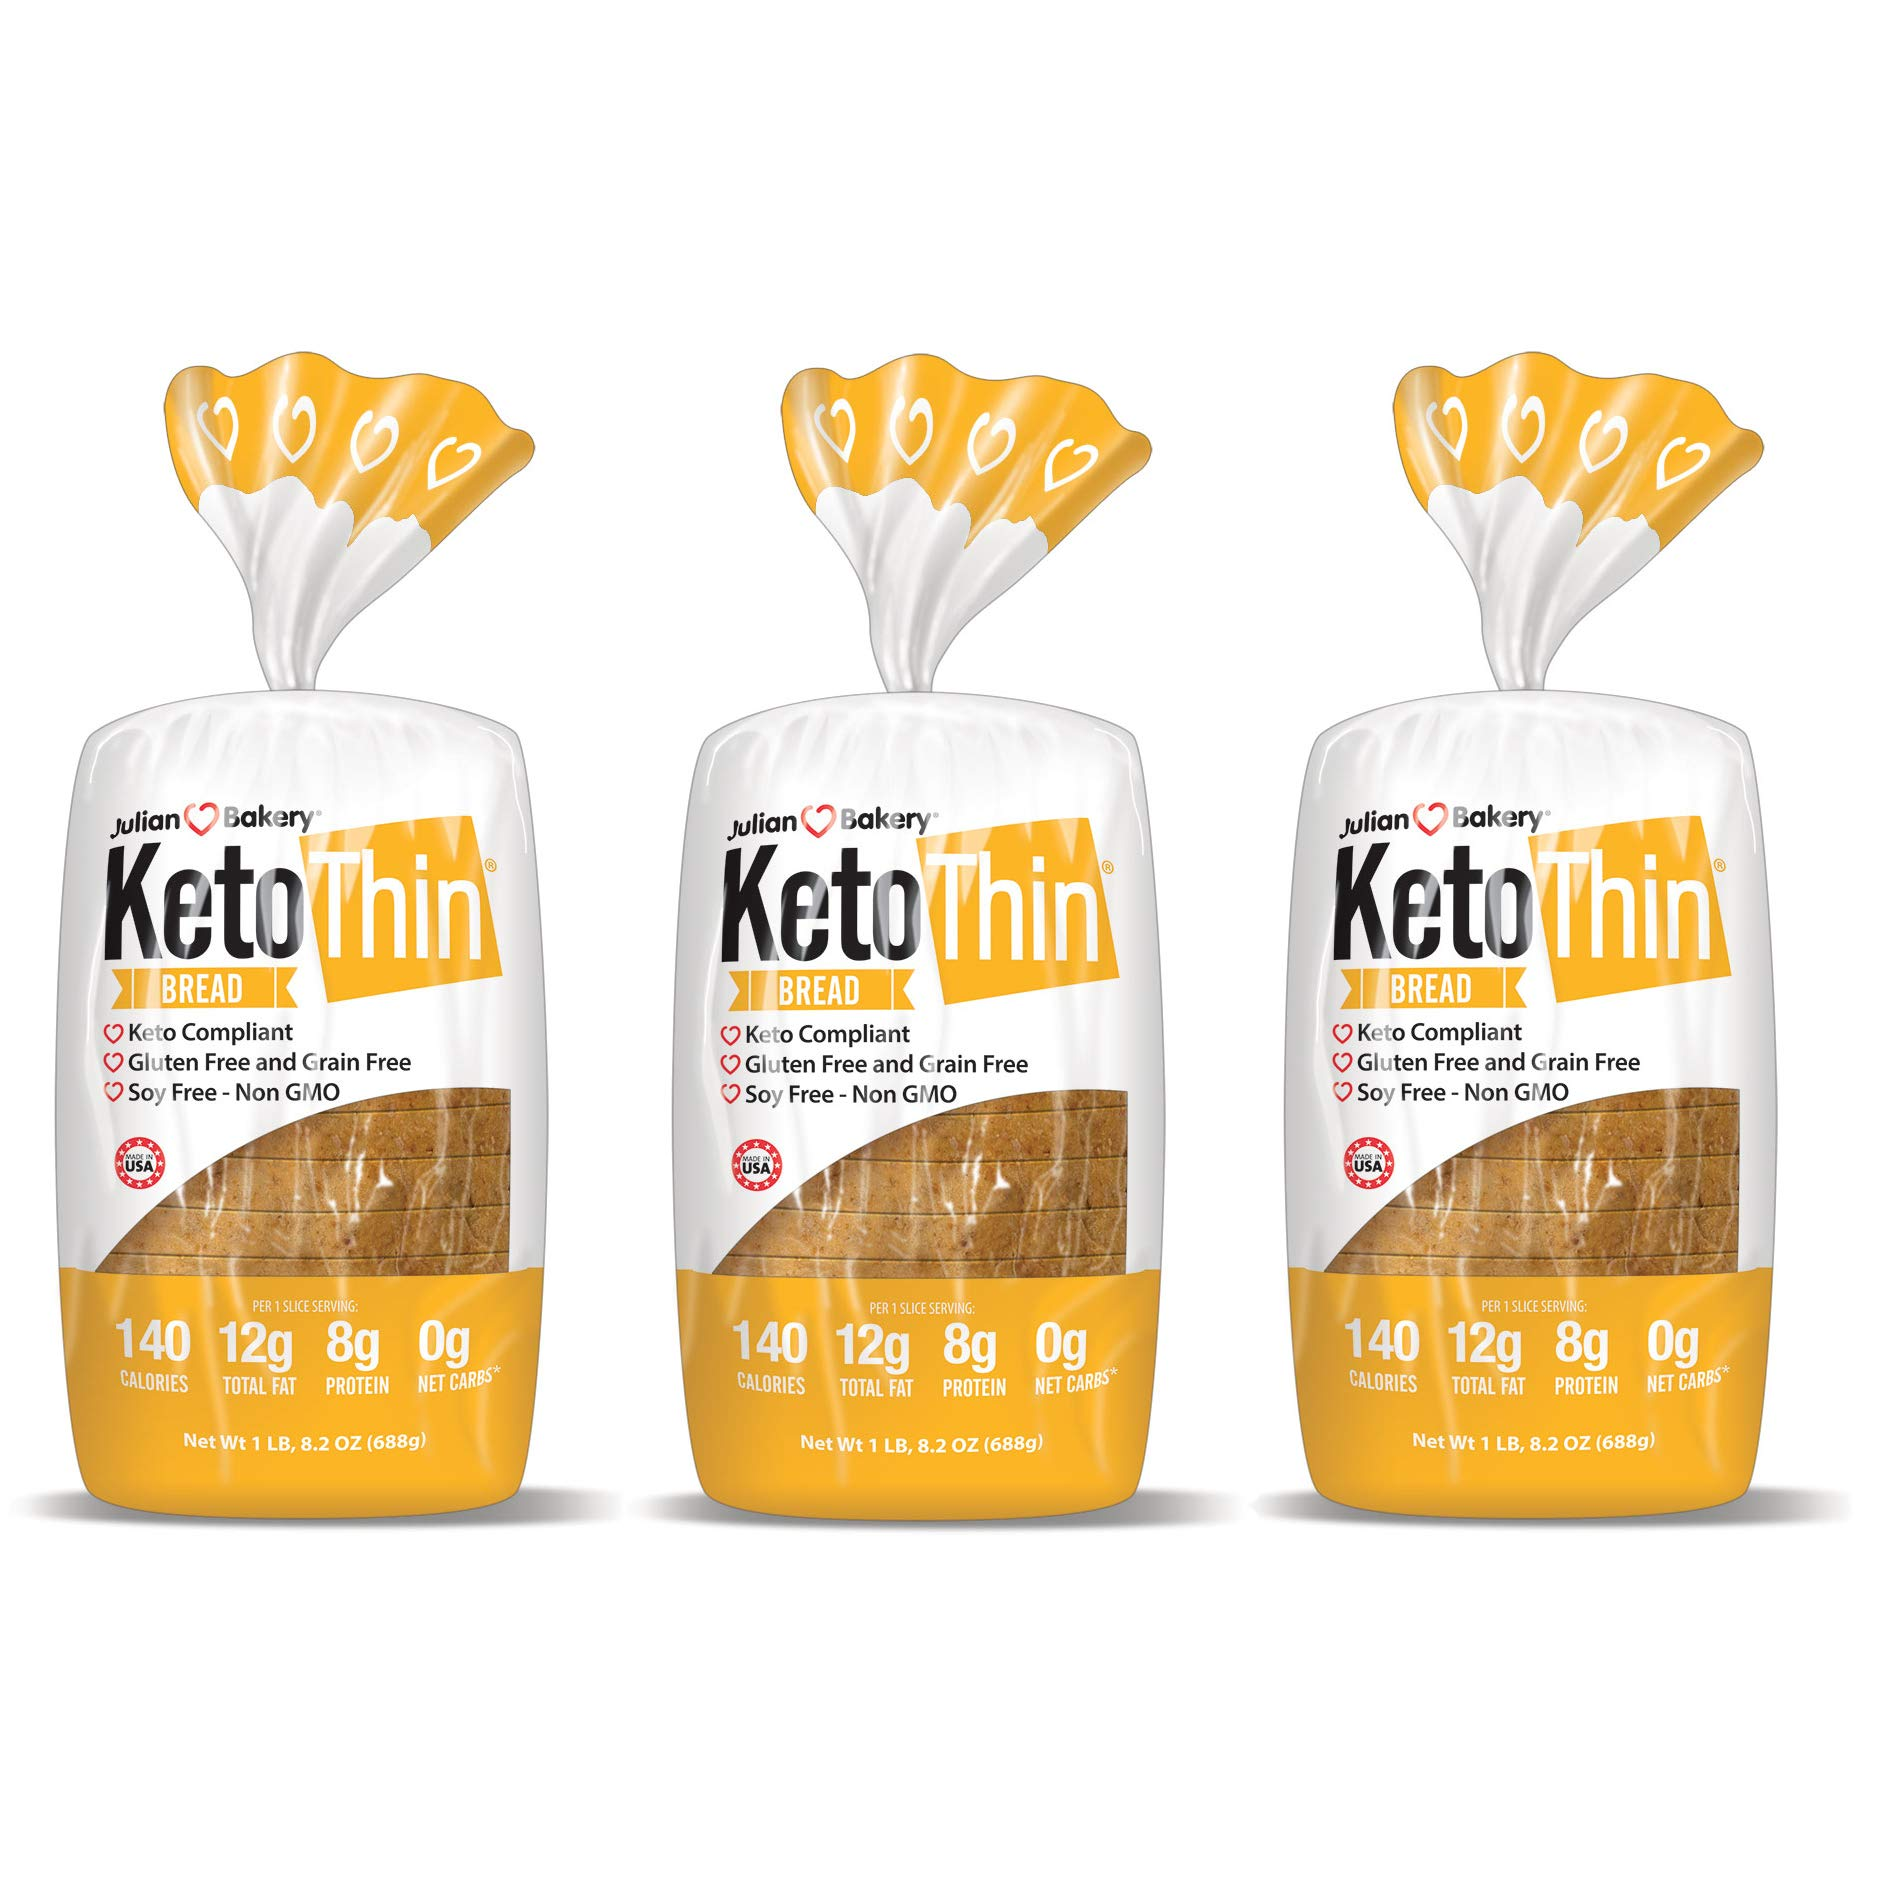 Keto Thin®   Bread   1 Carb   Gluten-Free   Grain-Free   (0 Net Carbs)   100% Keto   (3 Pack) by Julian Bakery